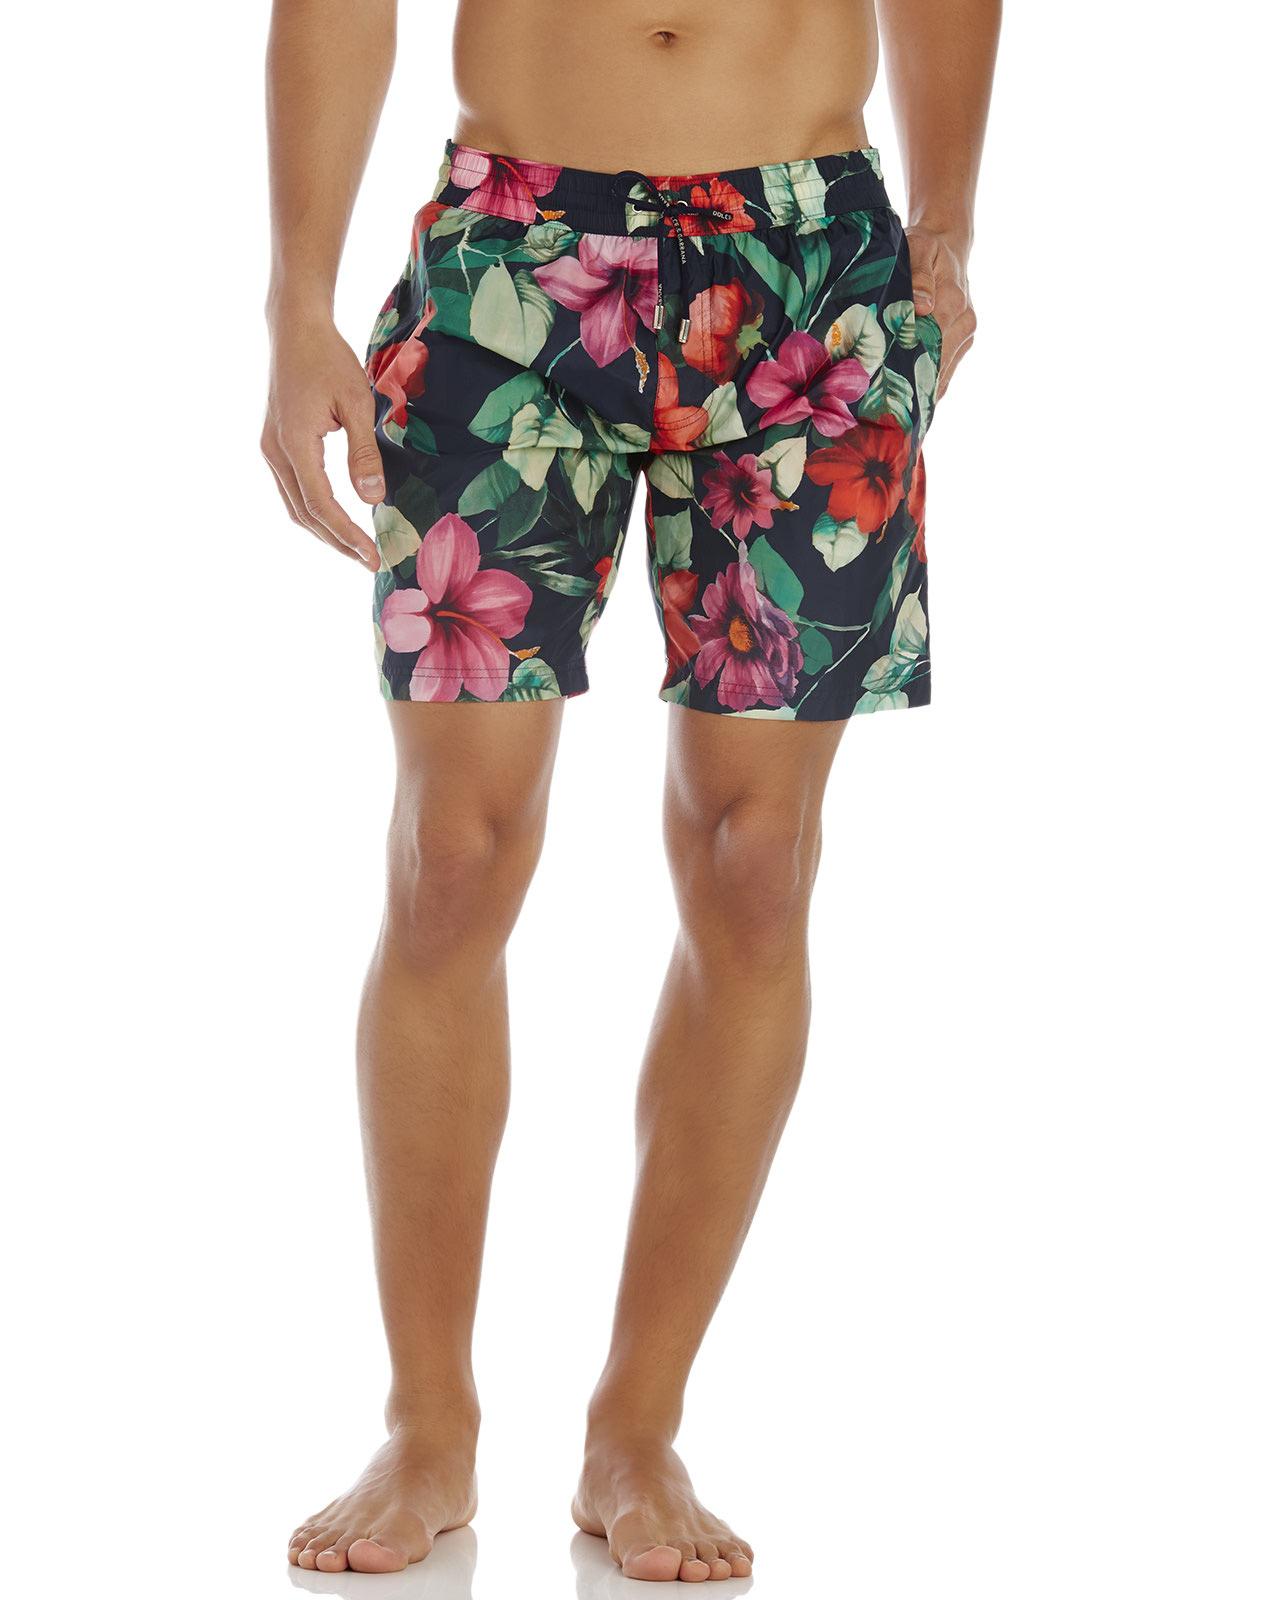 14db4b489de34 Dolce & Gabbana Navy Floral Print Swim Trunks for Men - Lyst